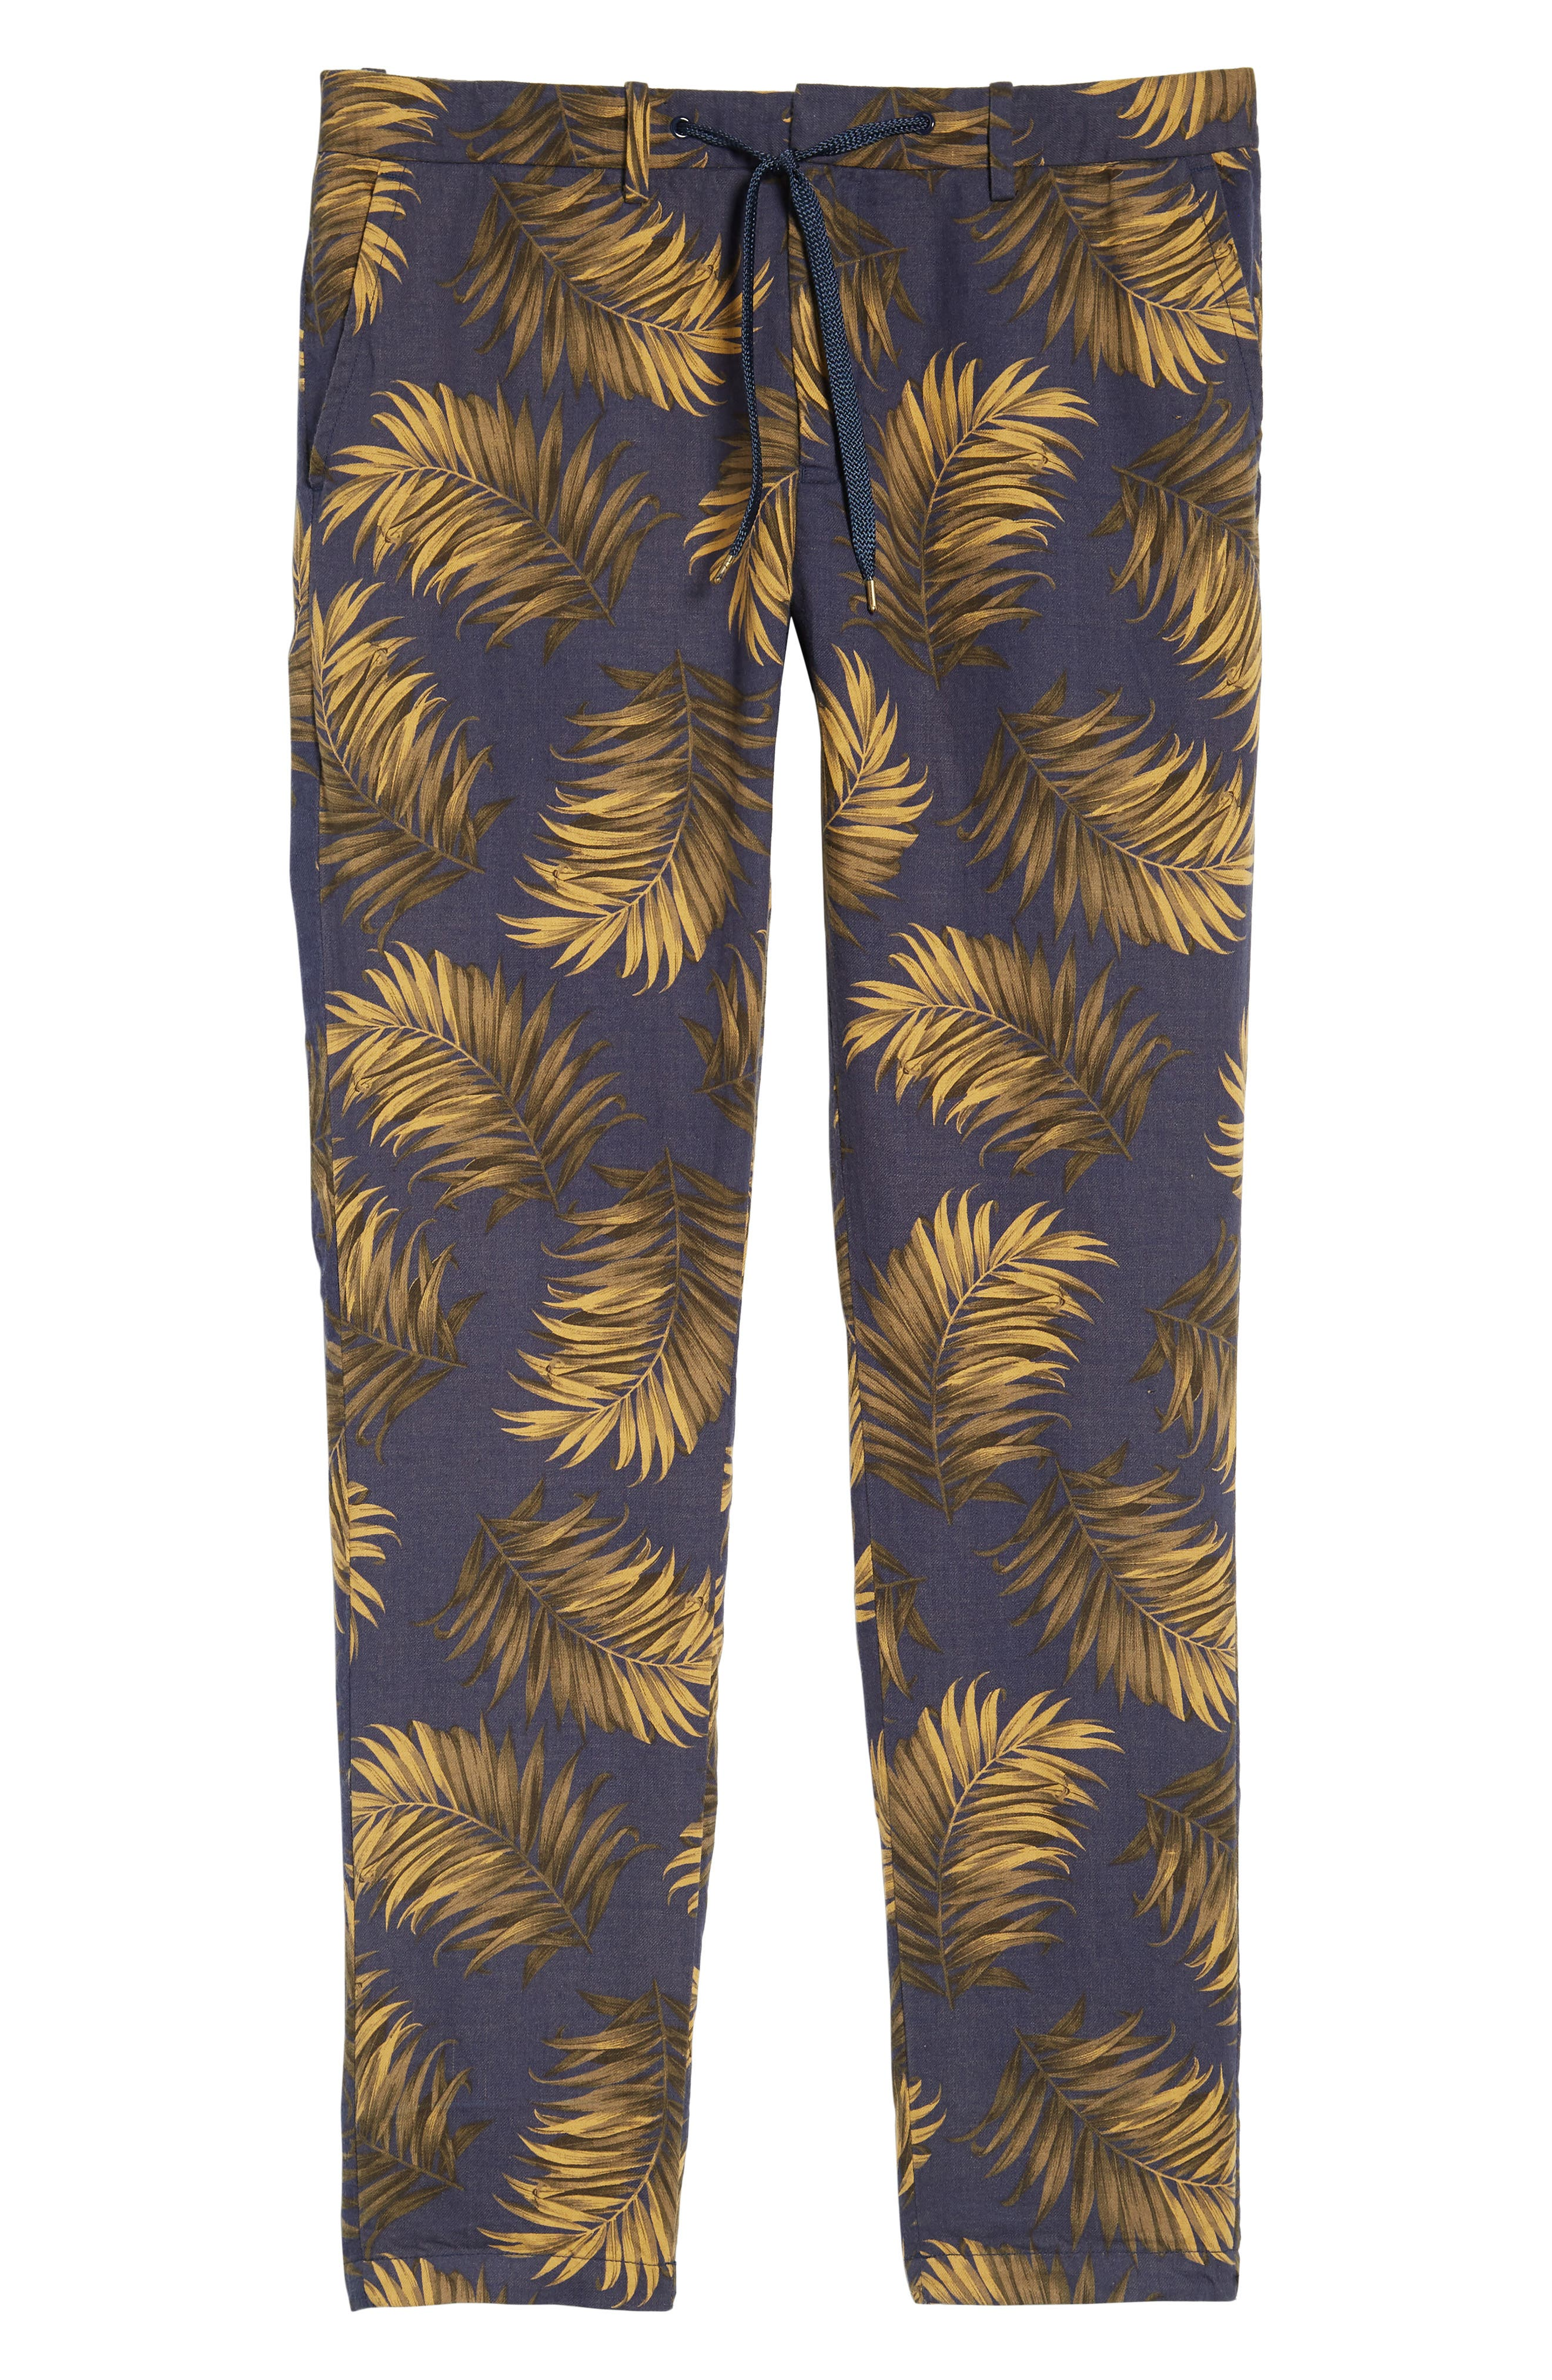 Linen Beach Pants,                             Alternate thumbnail 6, color,                             200